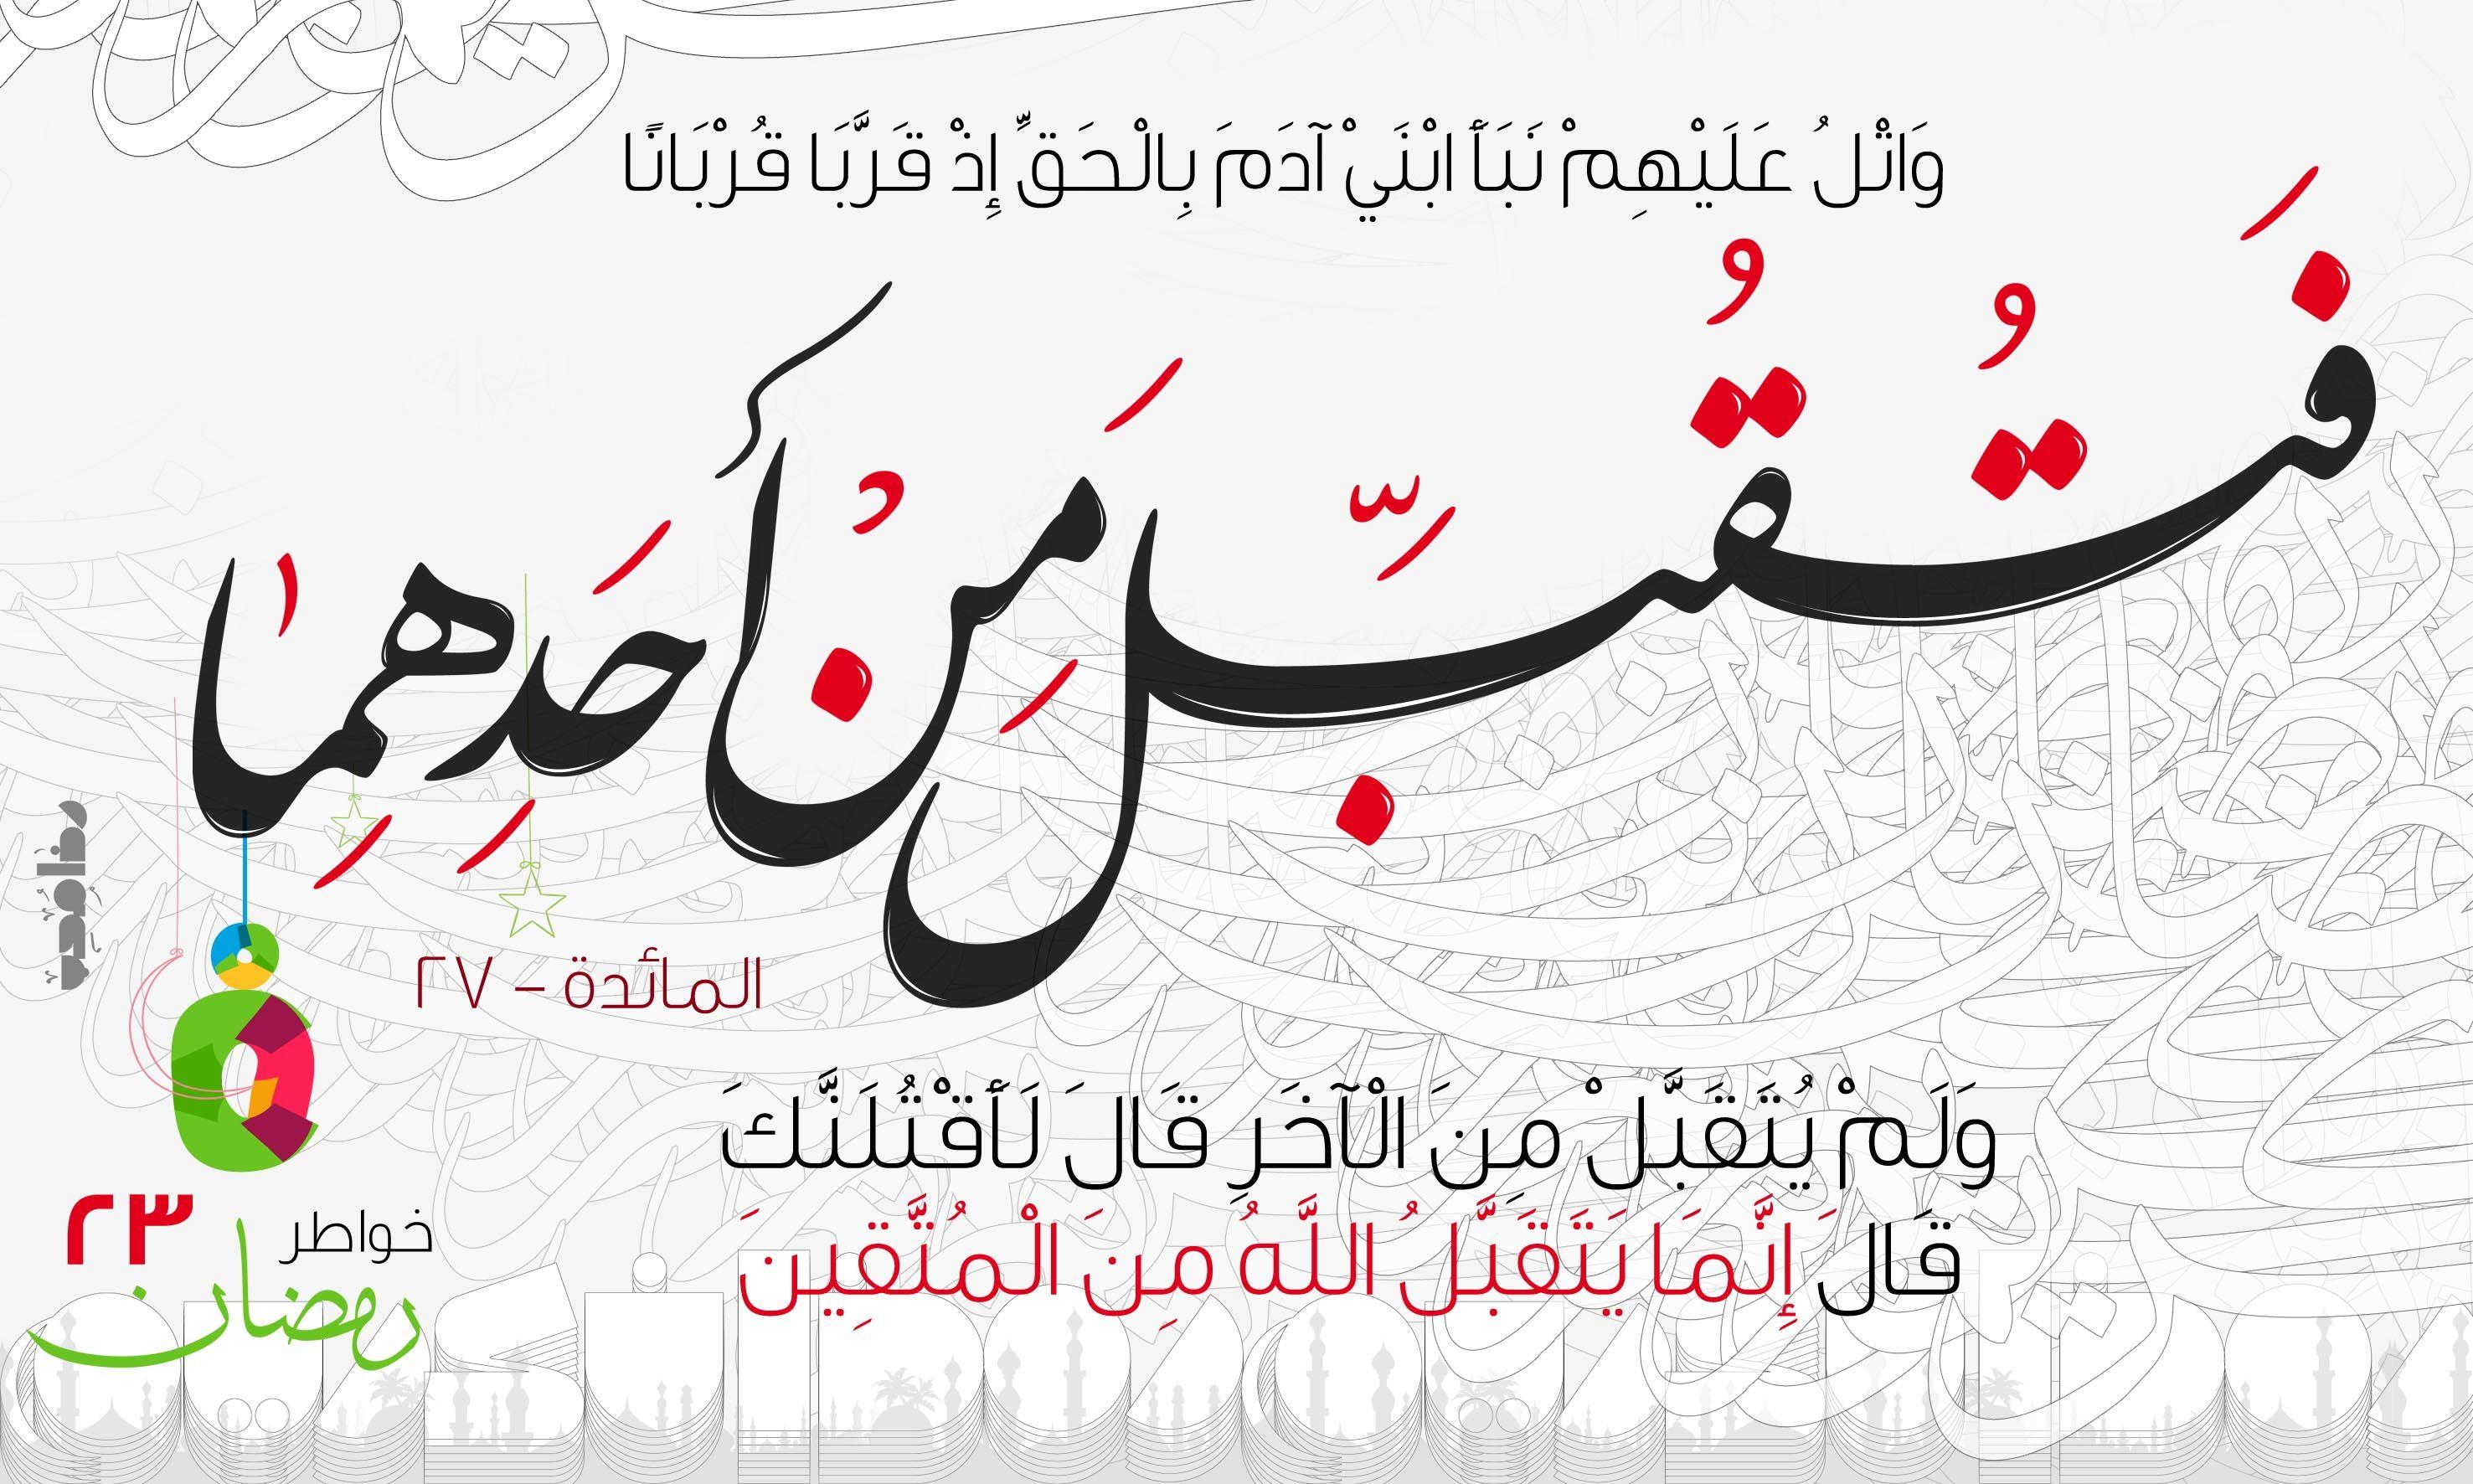 Pin By Reda Moheb On Typography Ramadan 2018 Typography Ramadan Arabic Calligraphy